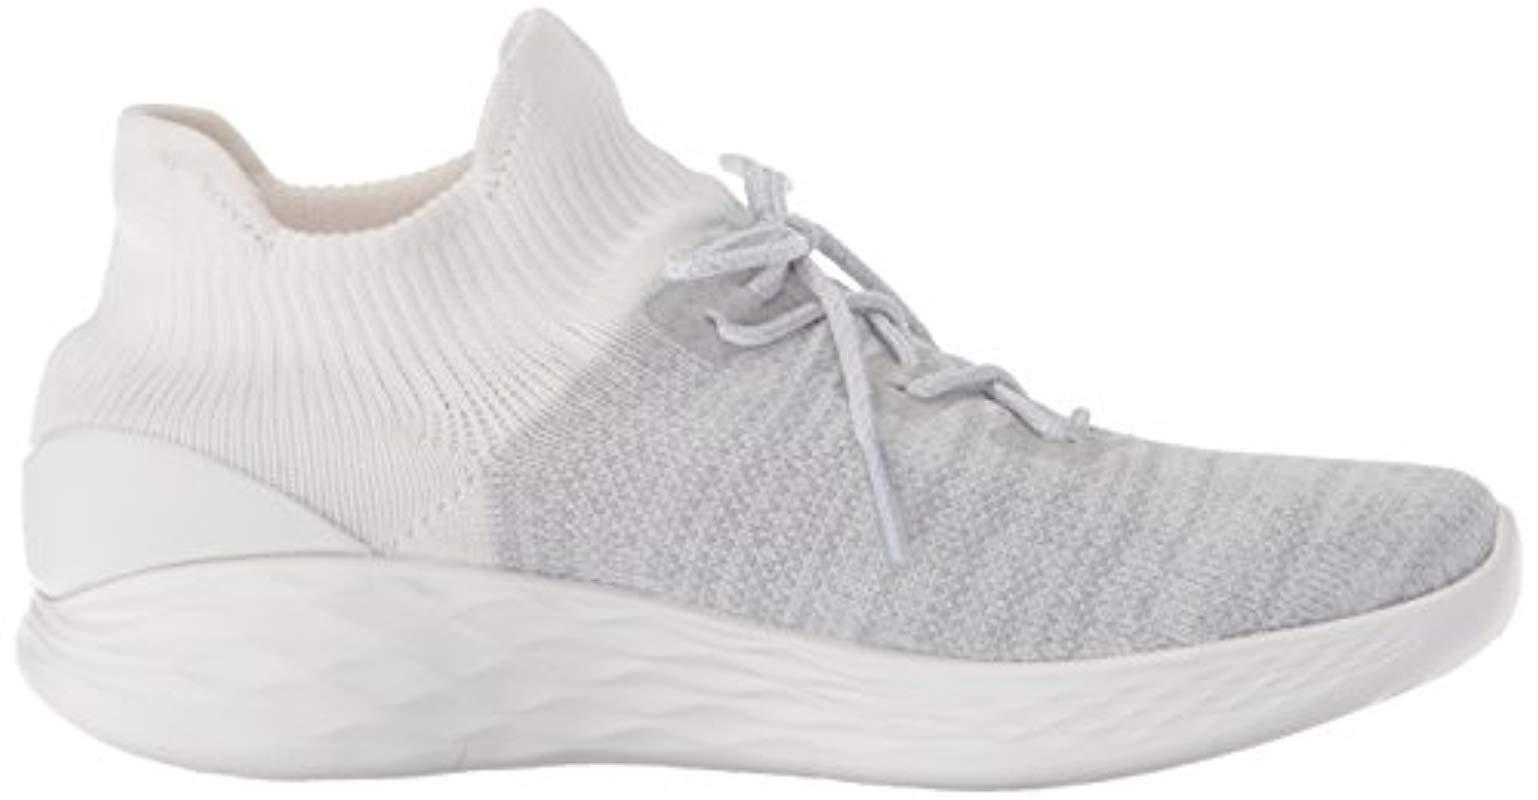 Skechers Lace You-14966 Sneaker in White